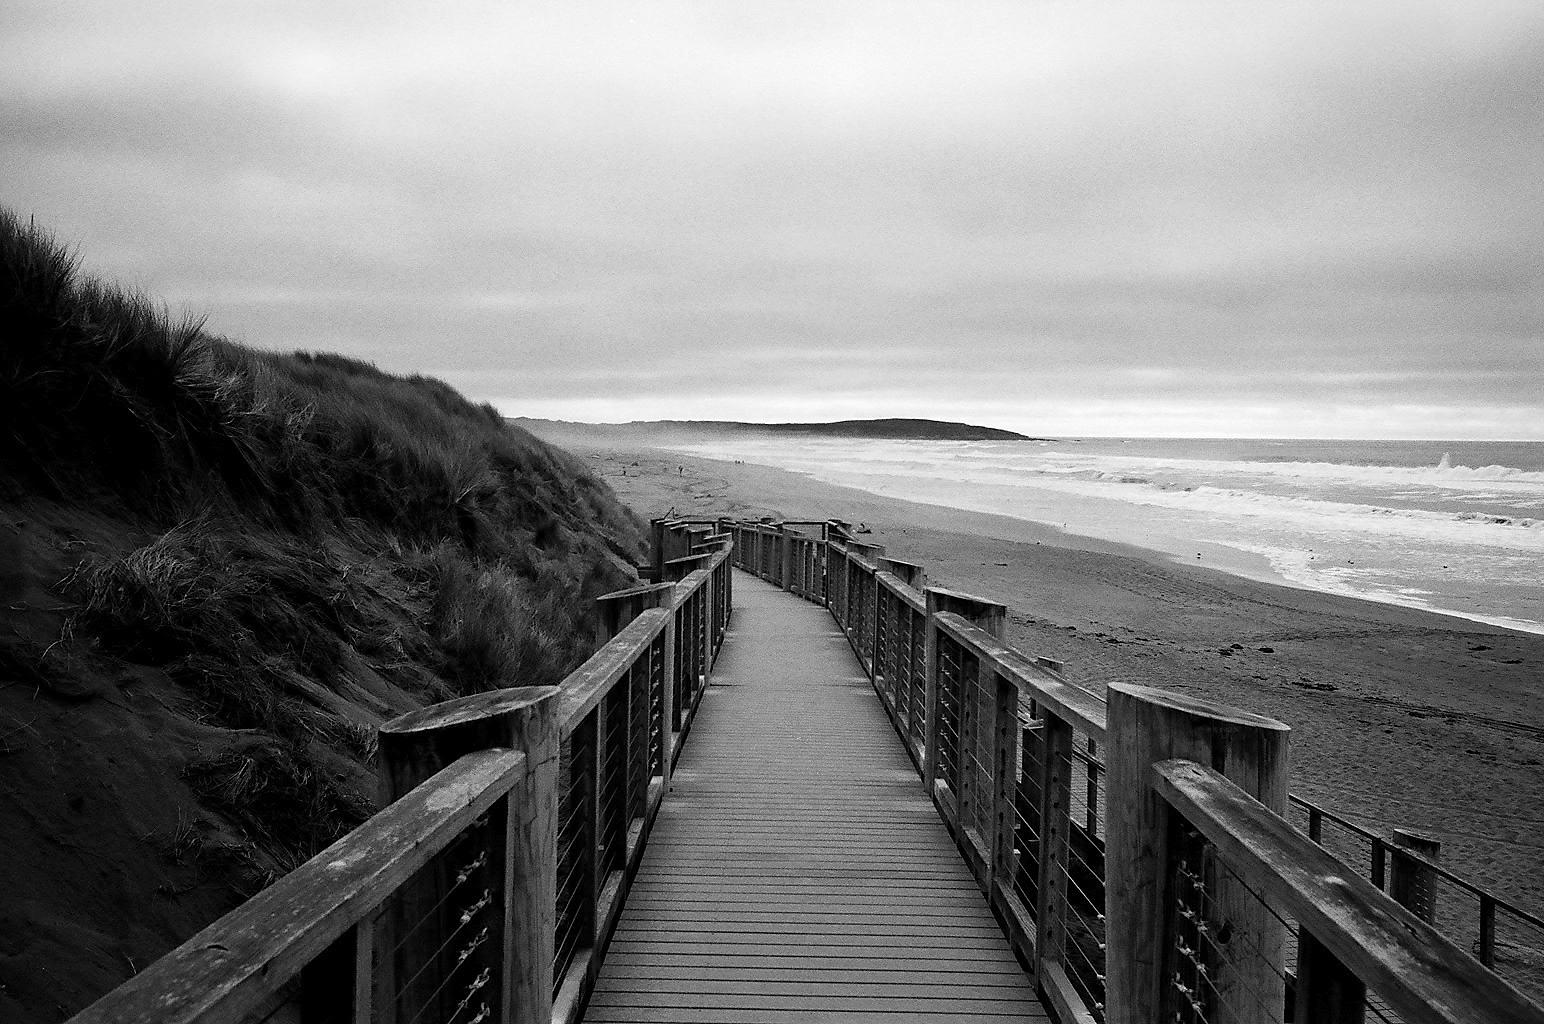 Sunday walk with Leica M4, 50 Summicron, Kodak Tmax 100